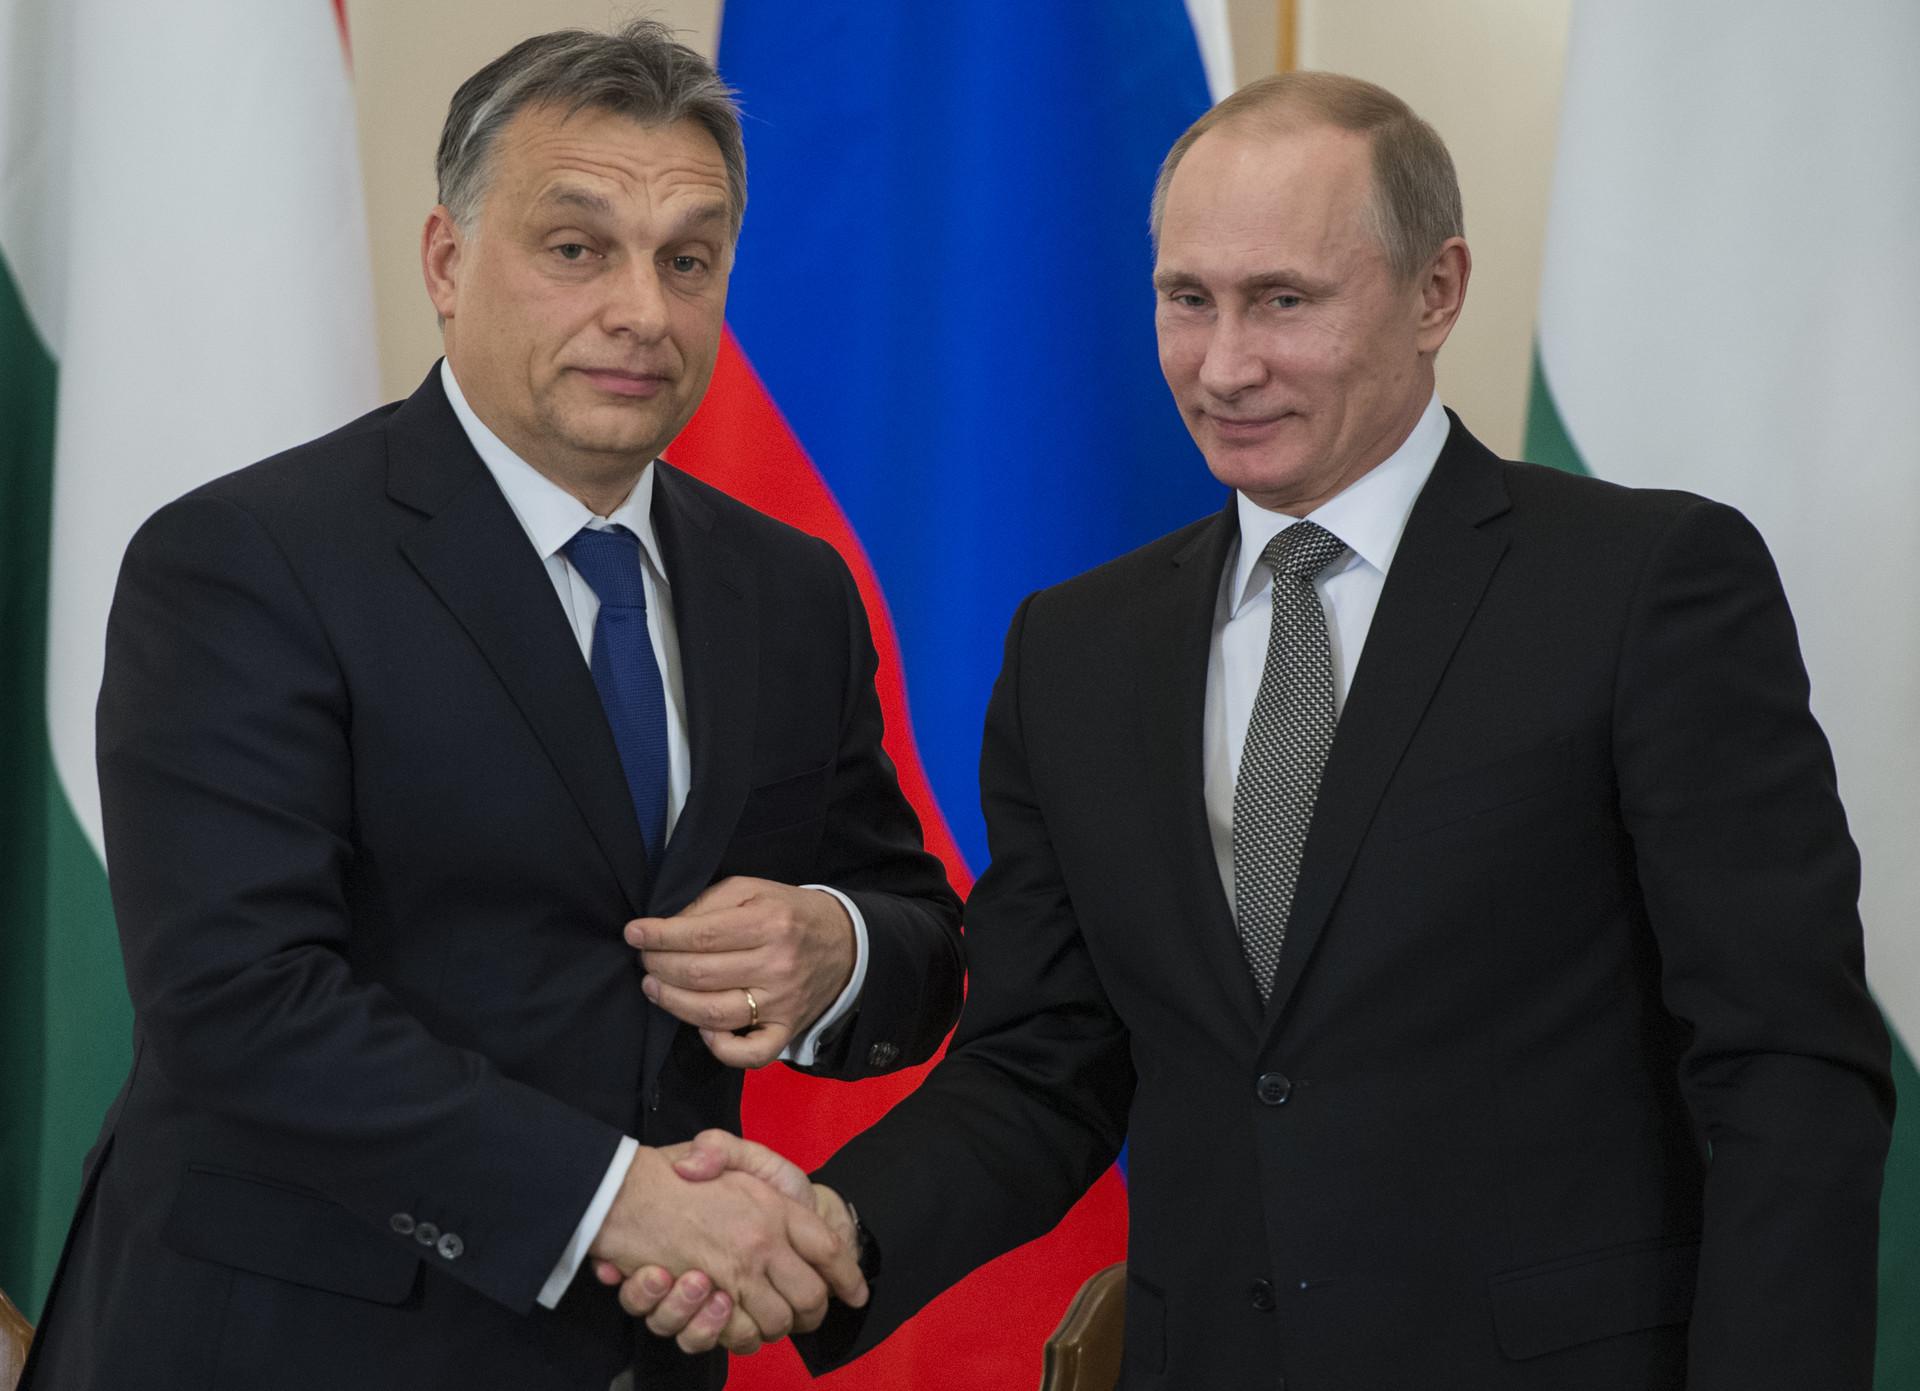 Visita de Putin a Hungría